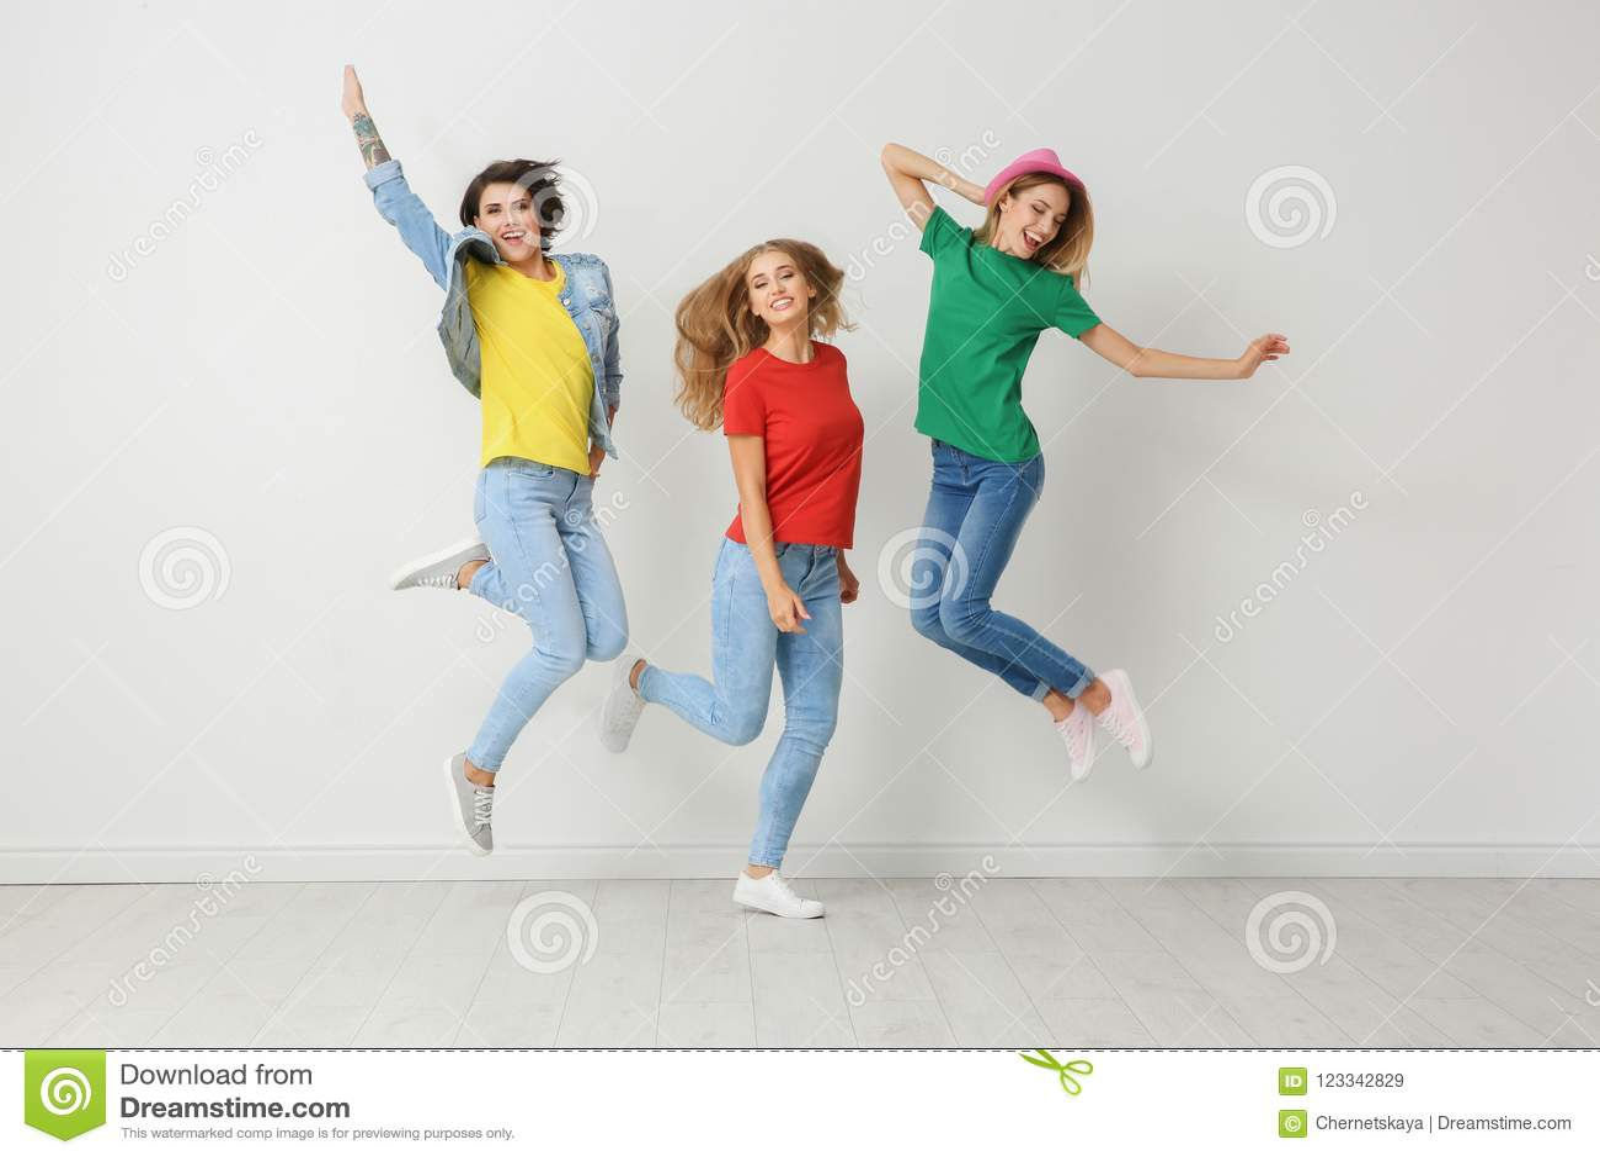 Groep jonge vrouwen in jeans en kleurrijke t-shirts